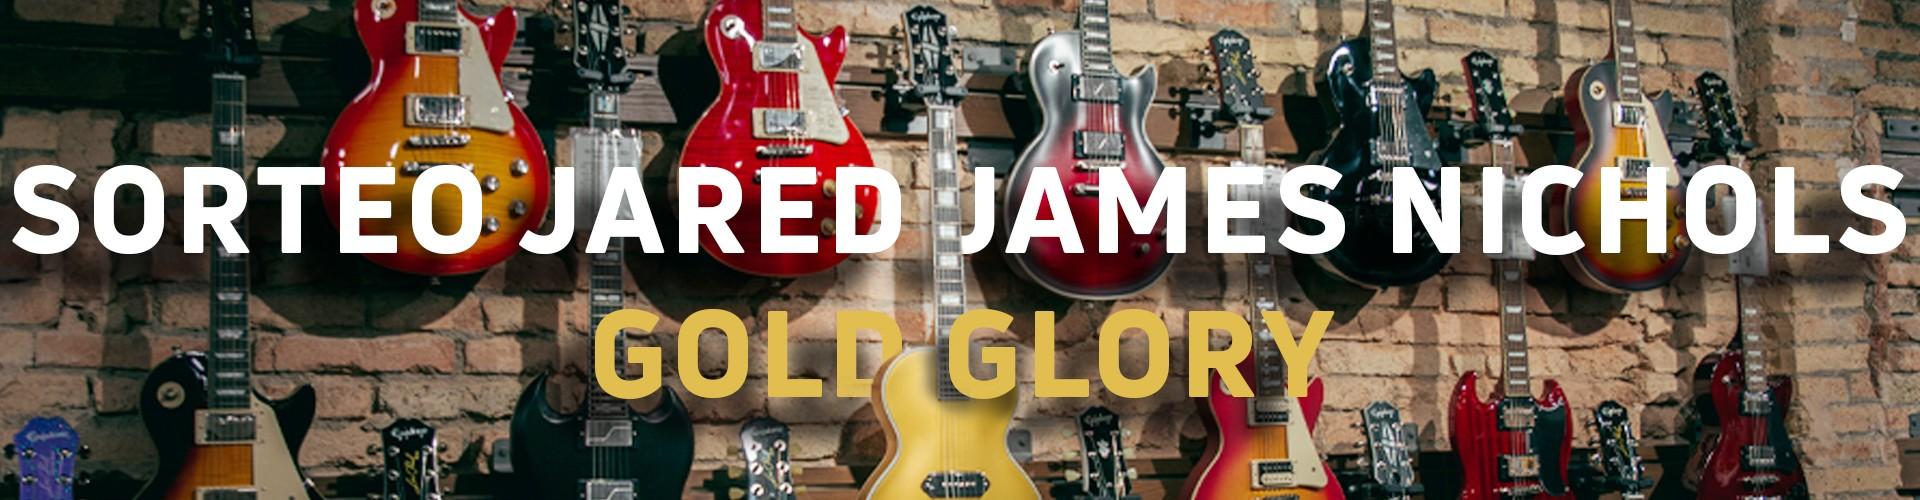 ¡Sorteamos una Epiphone Jared James Nichols Signature Gold Glory!